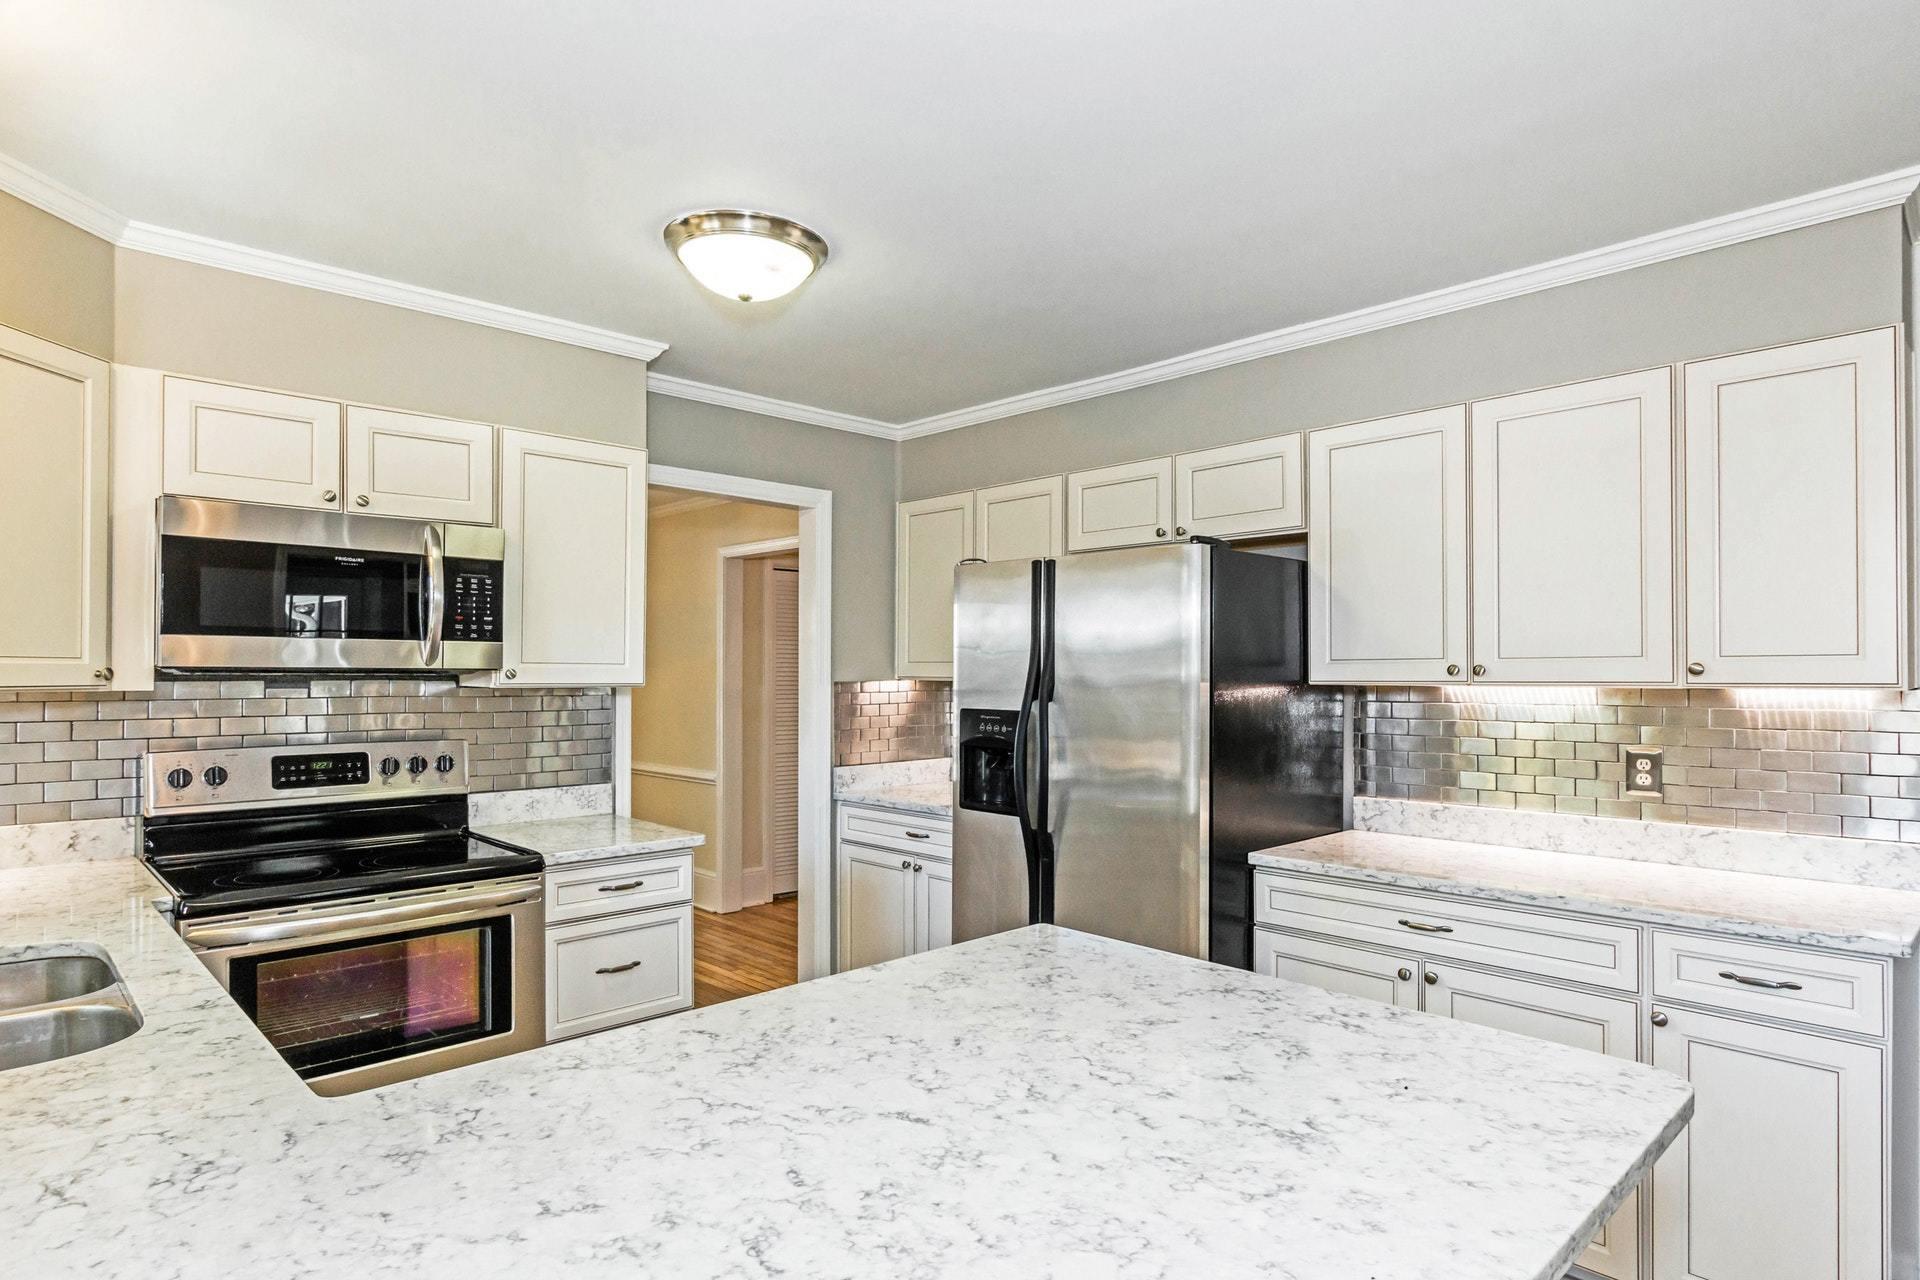 Shemwood II Homes For Sale - 969 Sea Gull, Mount Pleasant, SC - 20